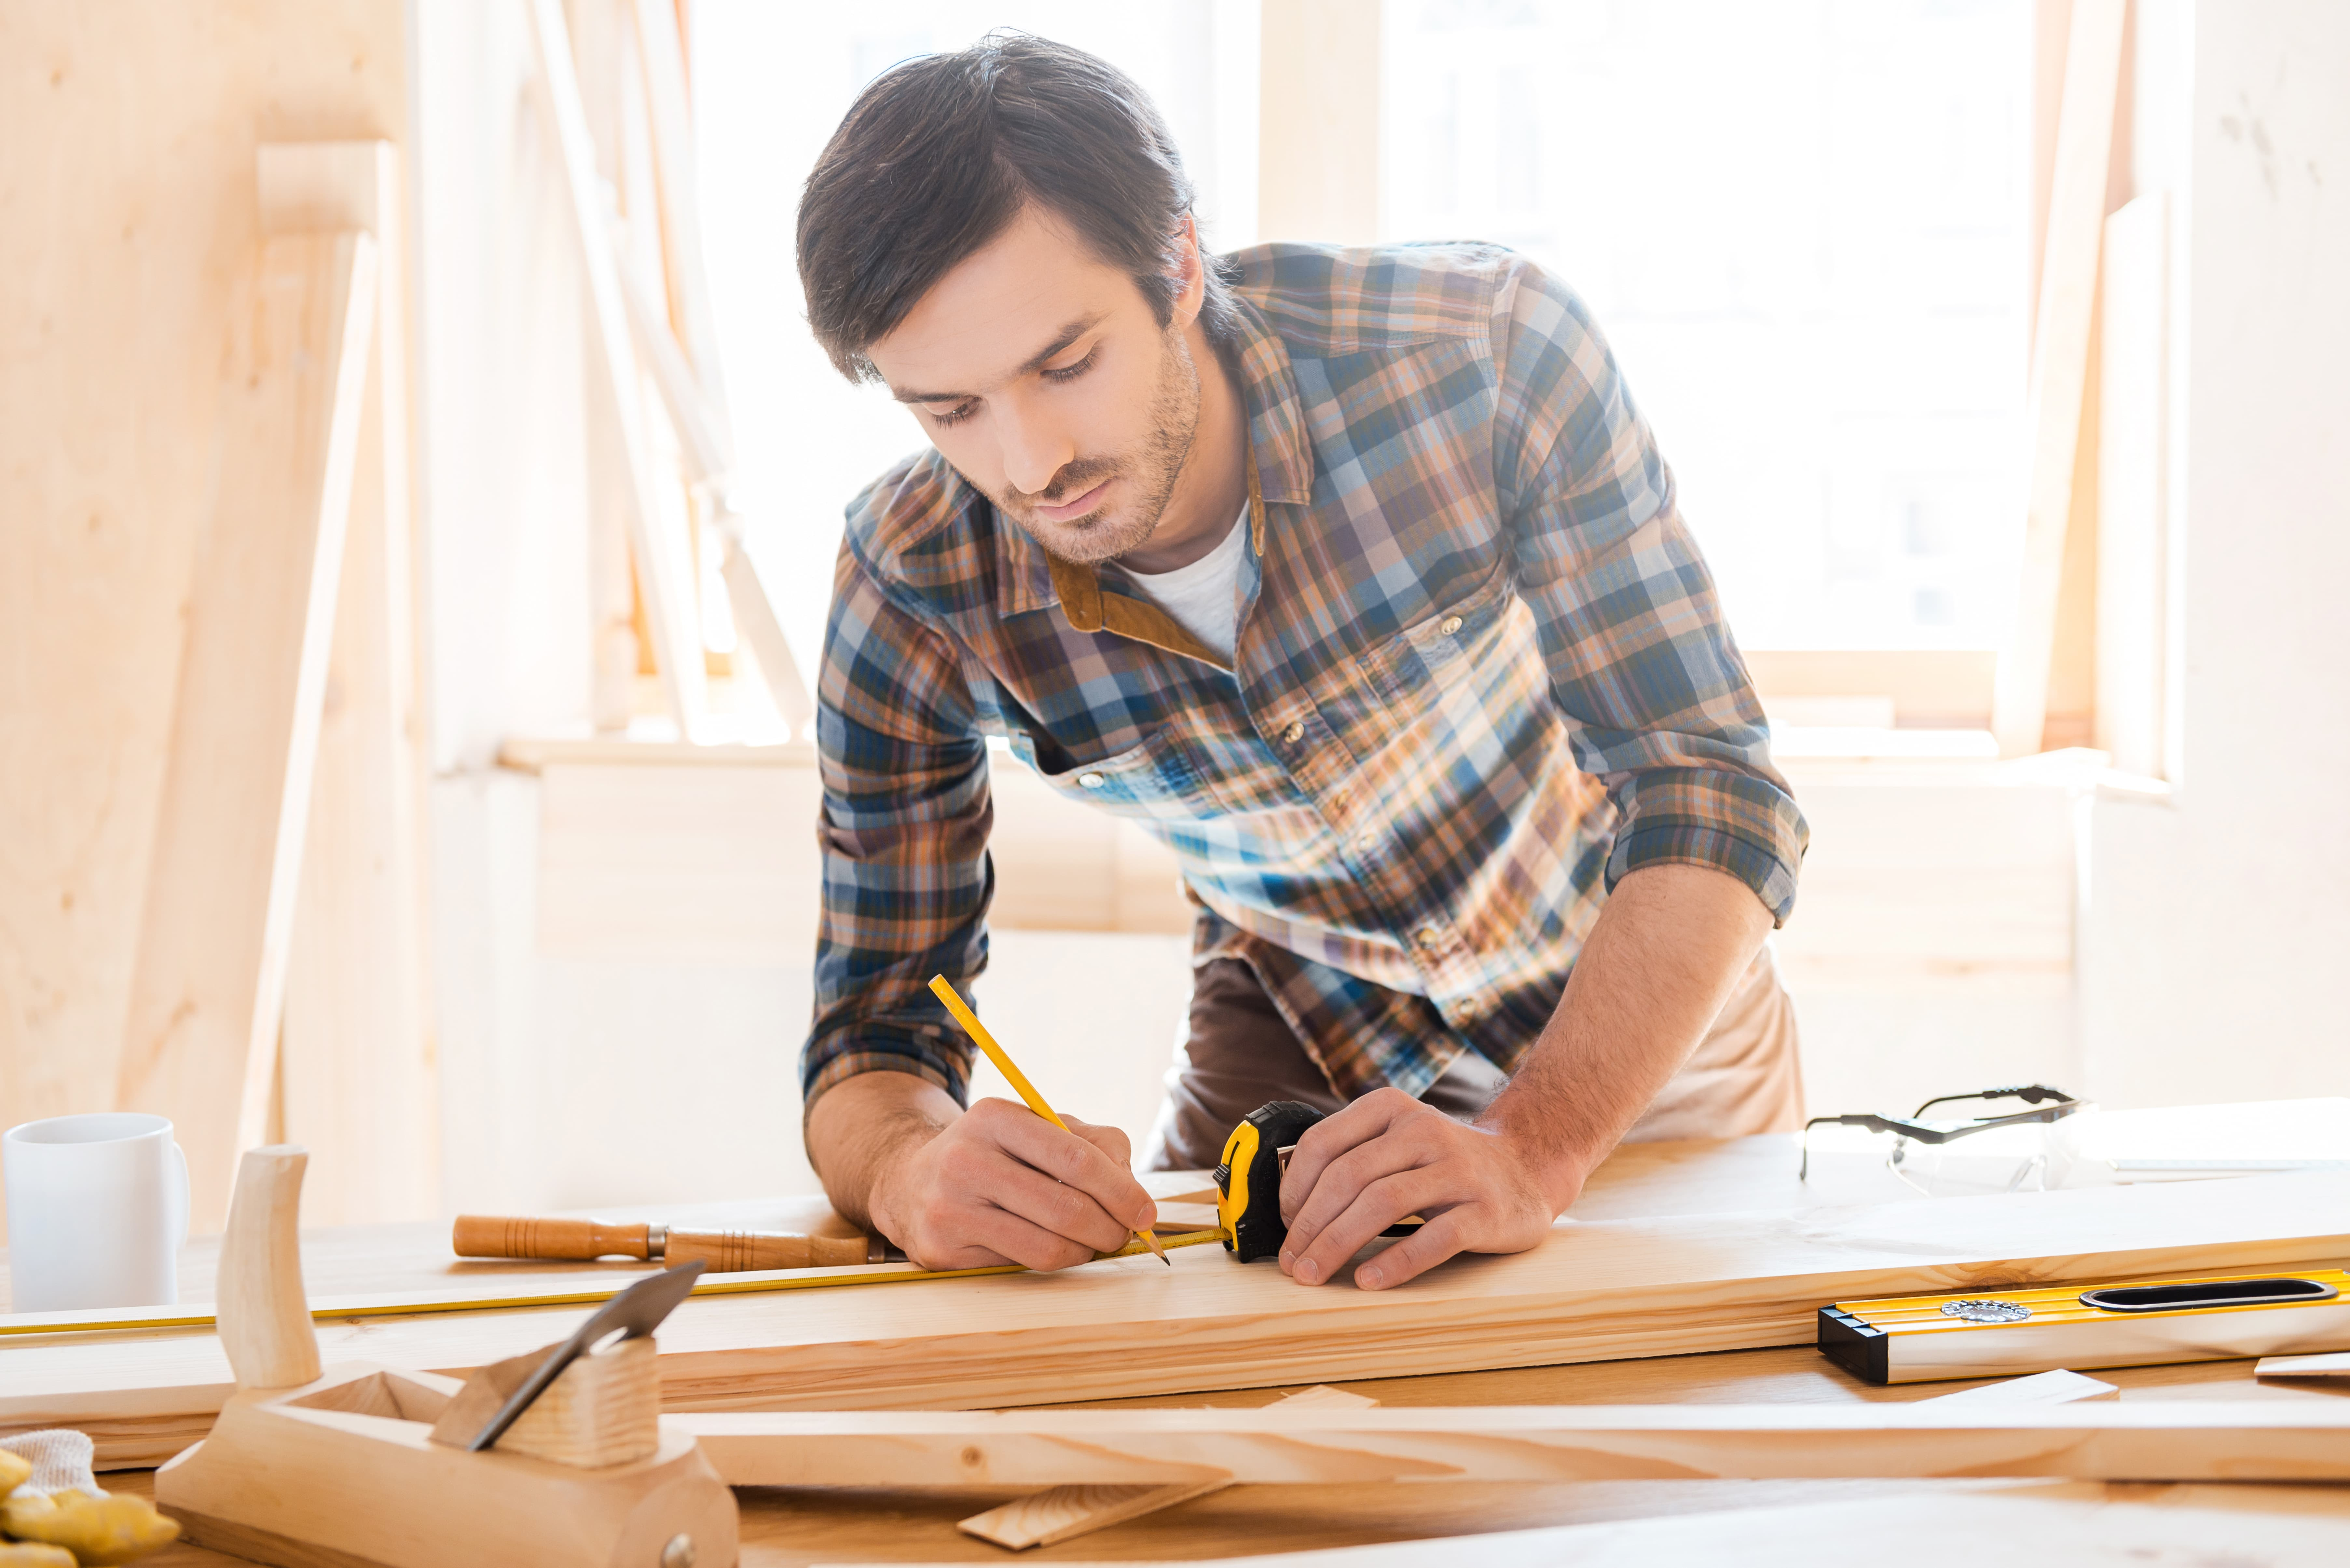 ways to improve construction efficiency